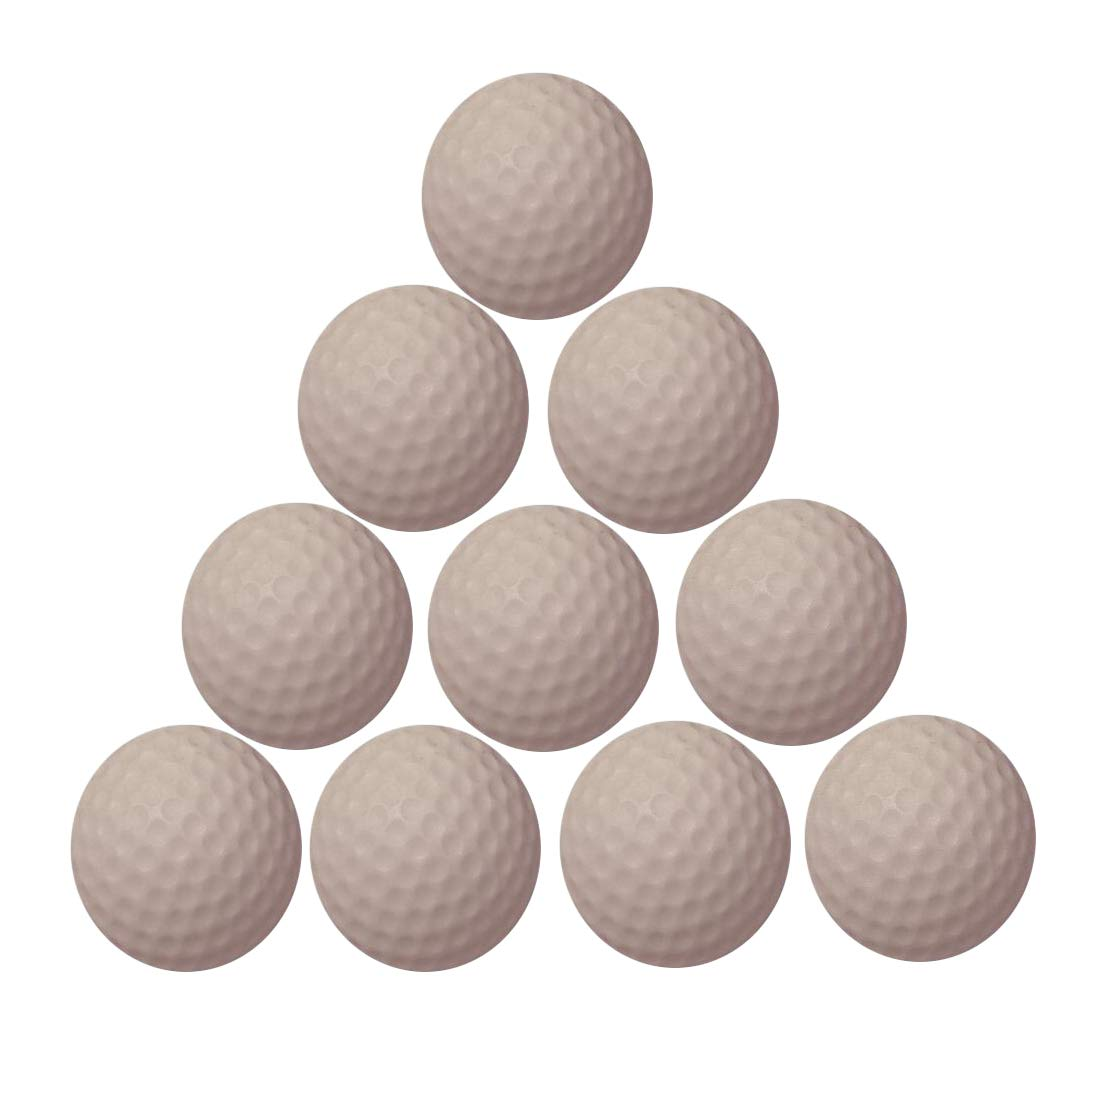 WYF 練習用ゴルフボール ソフトディンプル伸縮性 屋内屋外トレーニング ソフトフォームゴルフボール 10個  ホワイト B07MKV3932